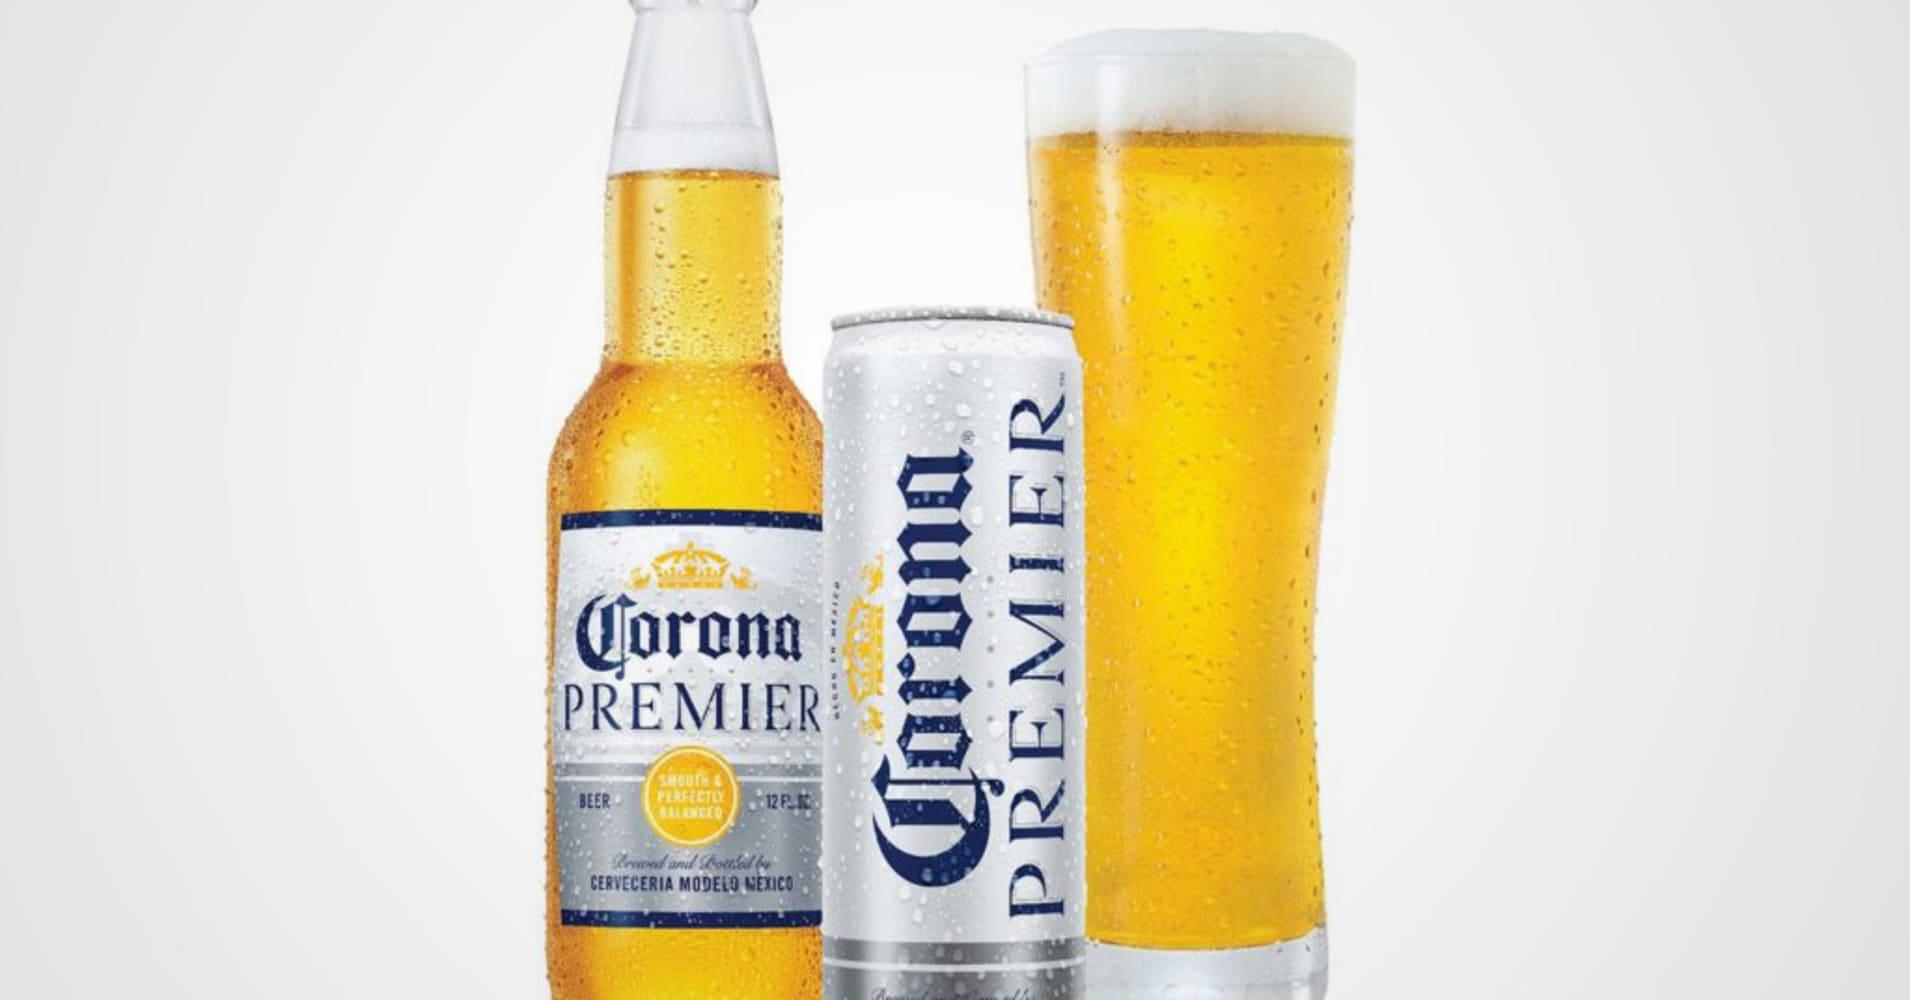 bottle Using as dildo corona